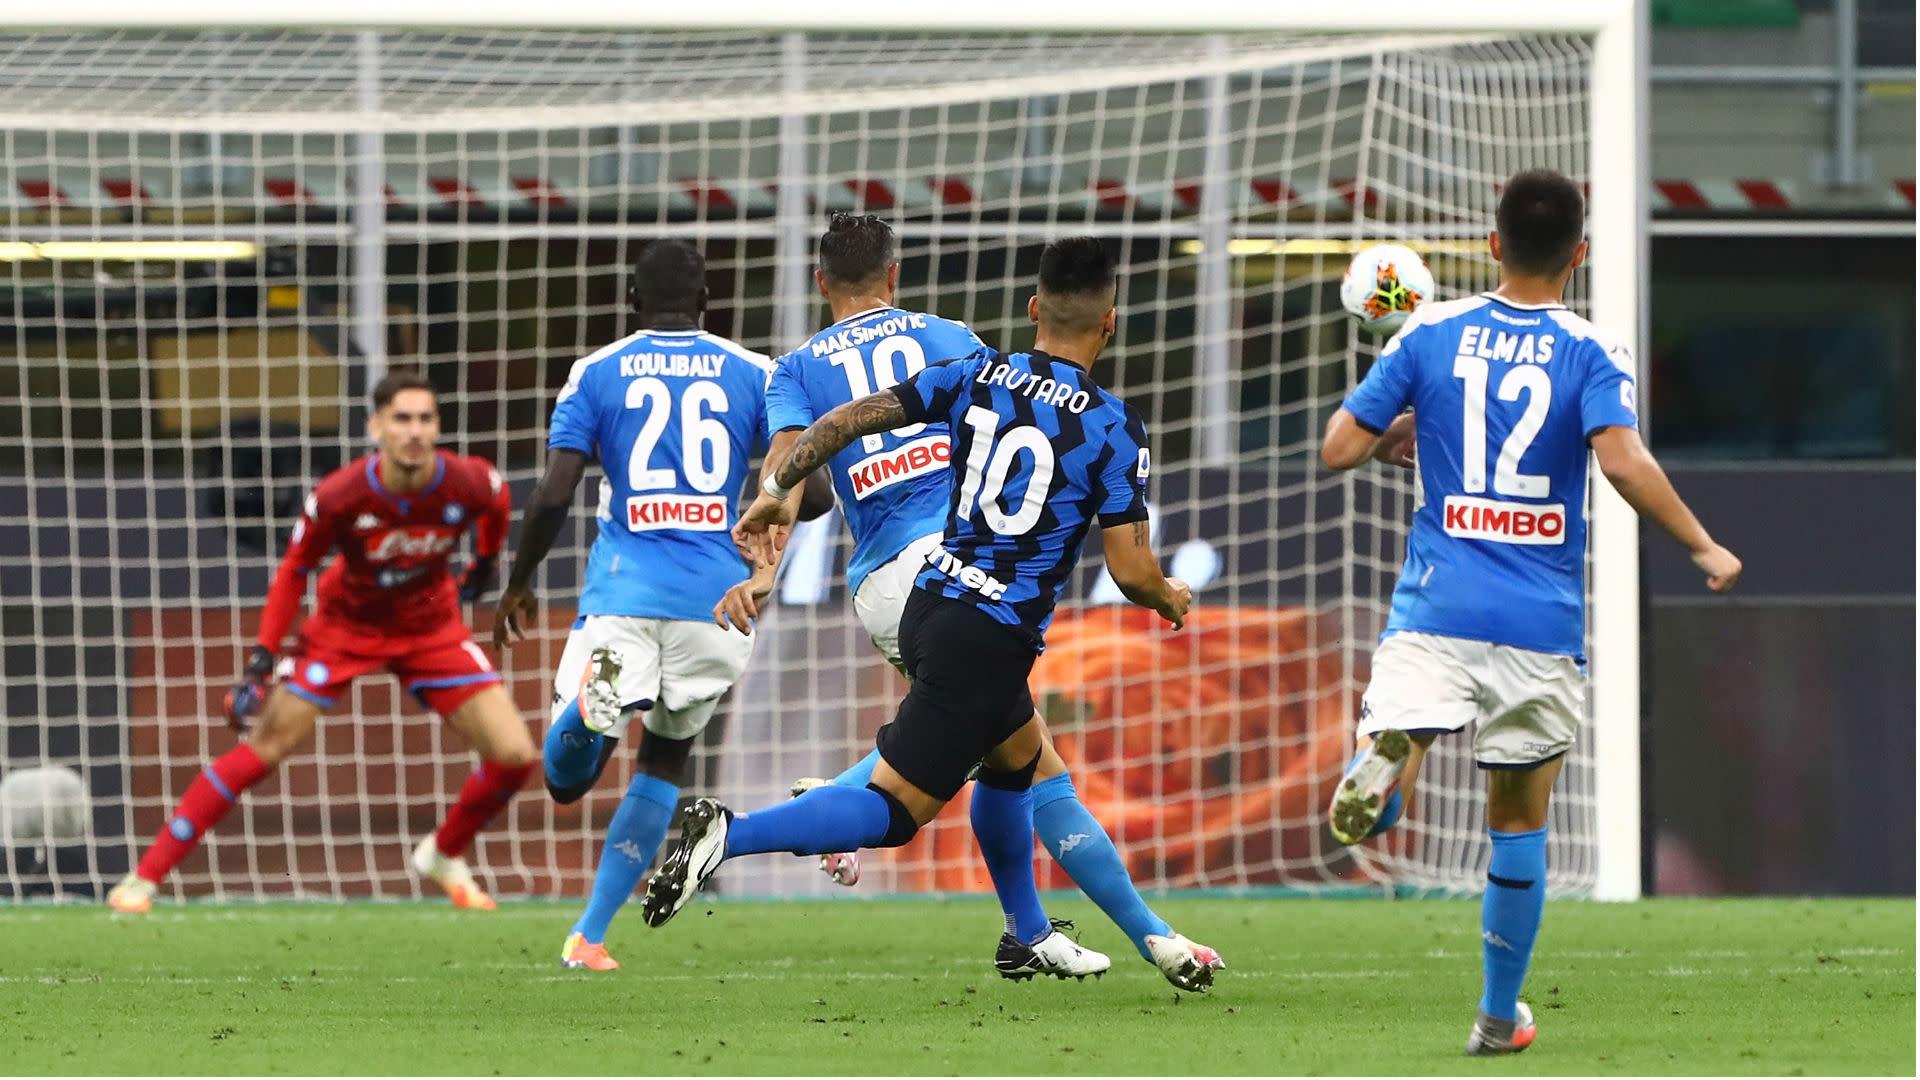 Inter 2-0 Napoli: Martinez scores stunner as unbeaten run continues